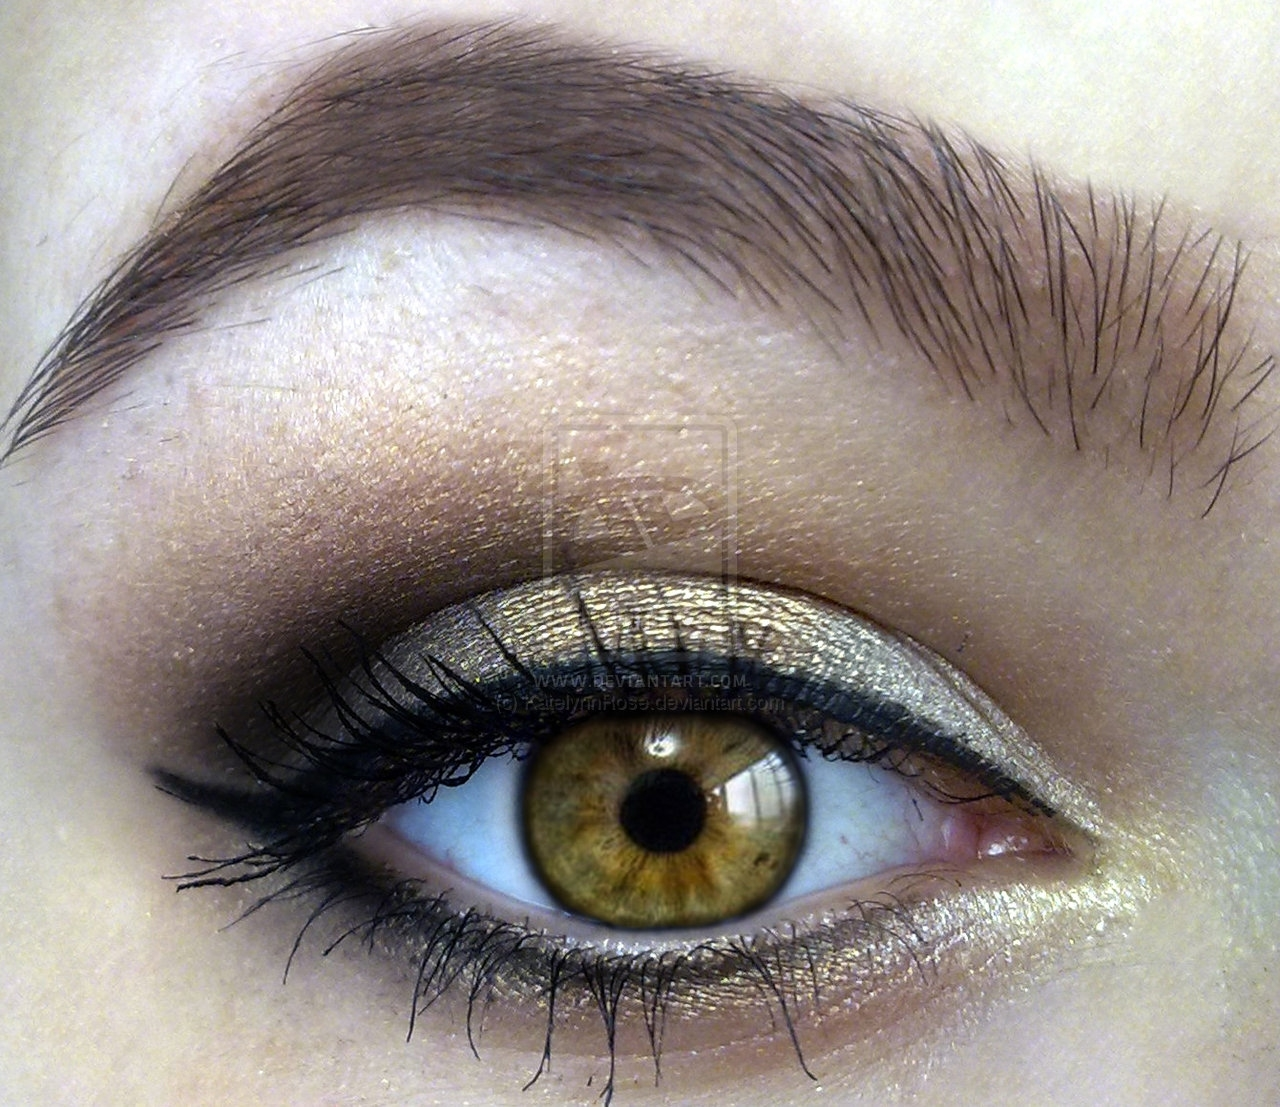 Cute Makeup Styles For Hazel Eyes | Saubhaya Makeup regarding Cute Makeup Looks For Hazel Eyes